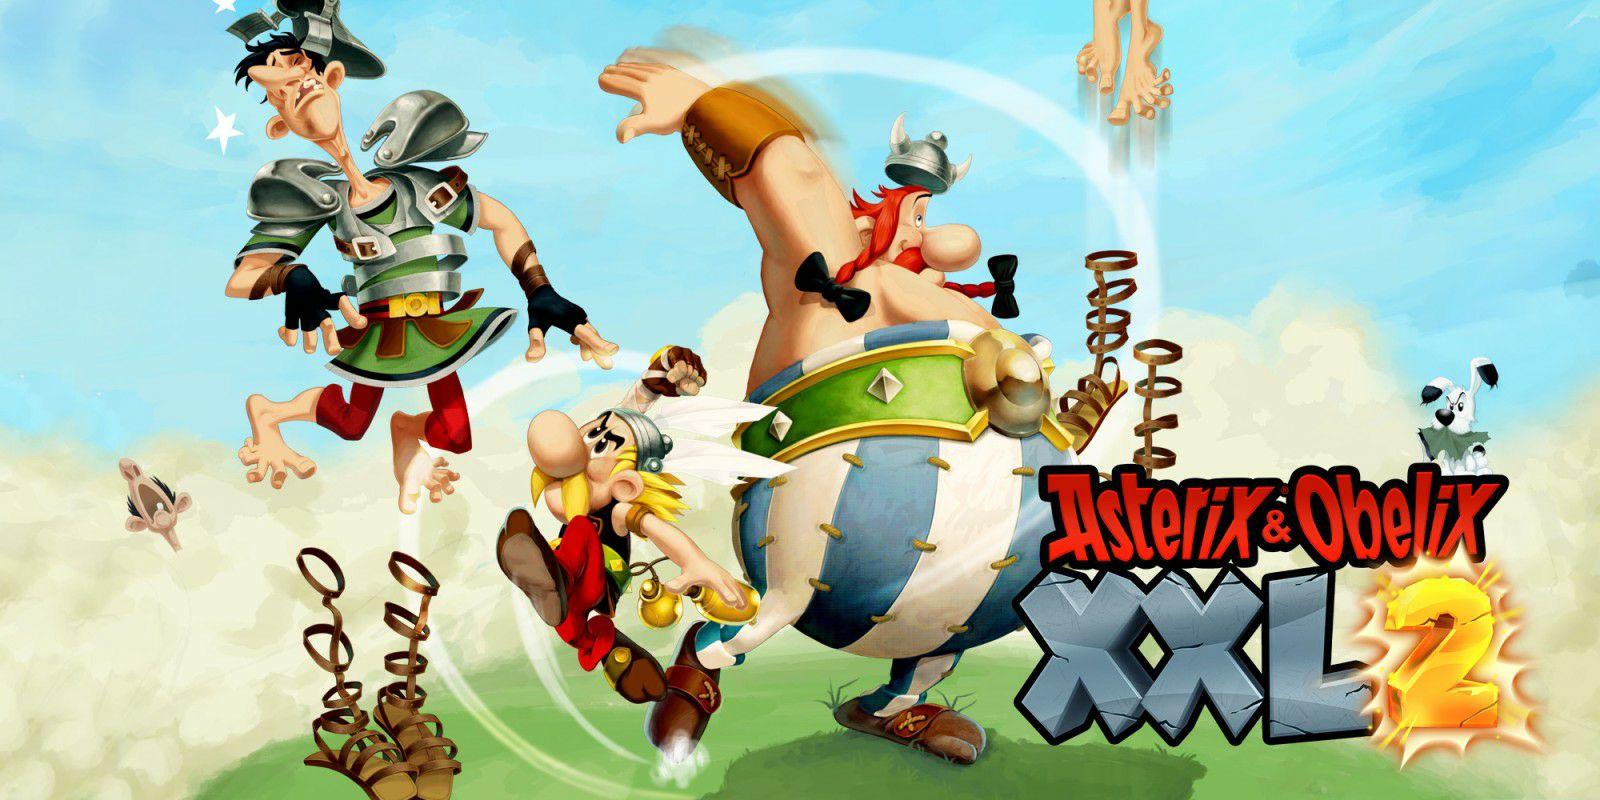 Asterix & Obelix XXL 2 for Nintendo Switch £10.79 @ Nintendo eShop